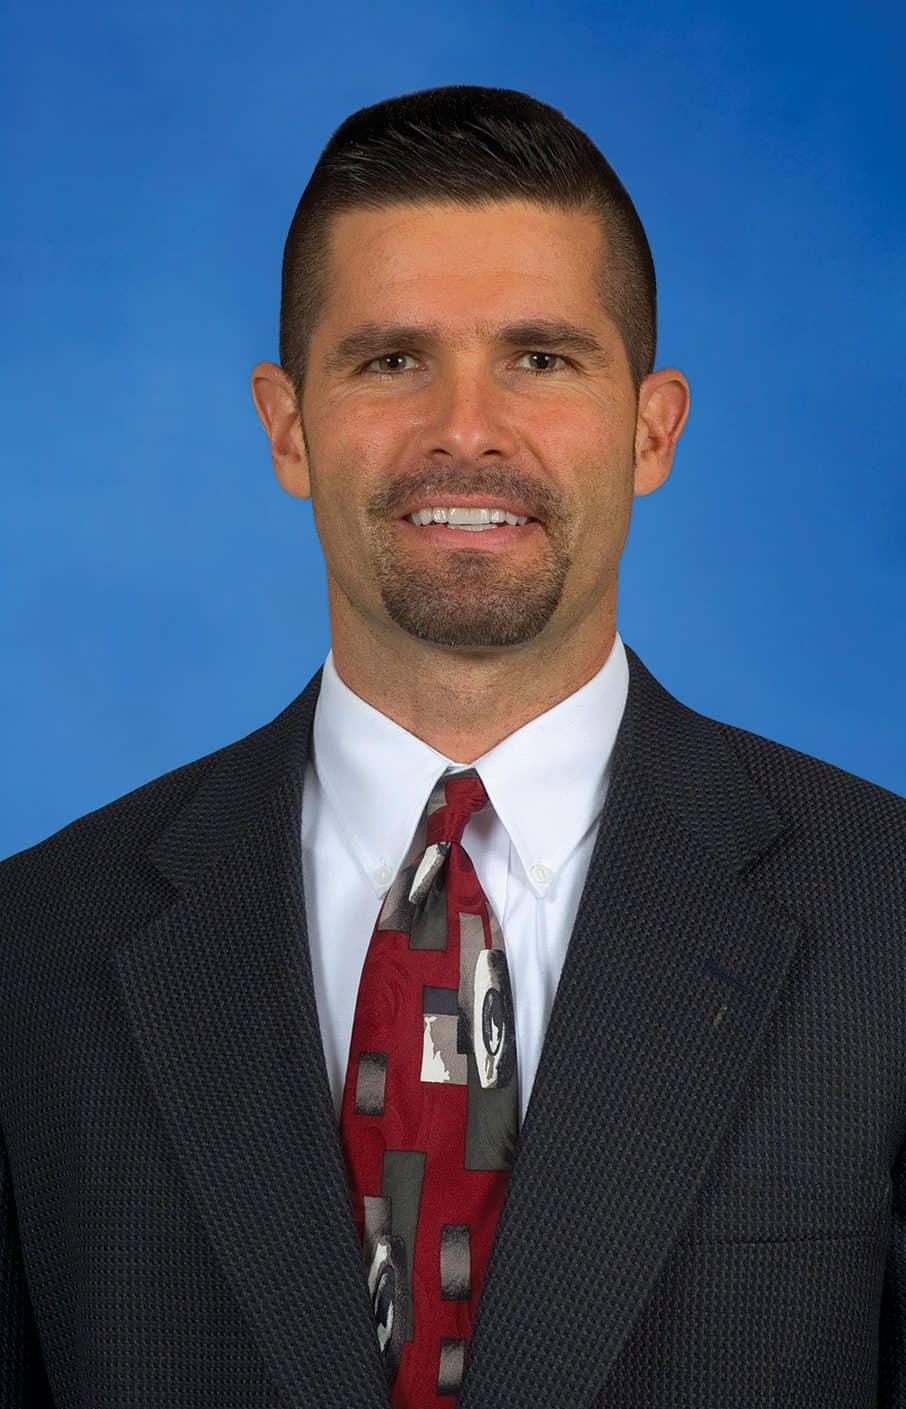 Stephen M. Brennan, MD, DABA